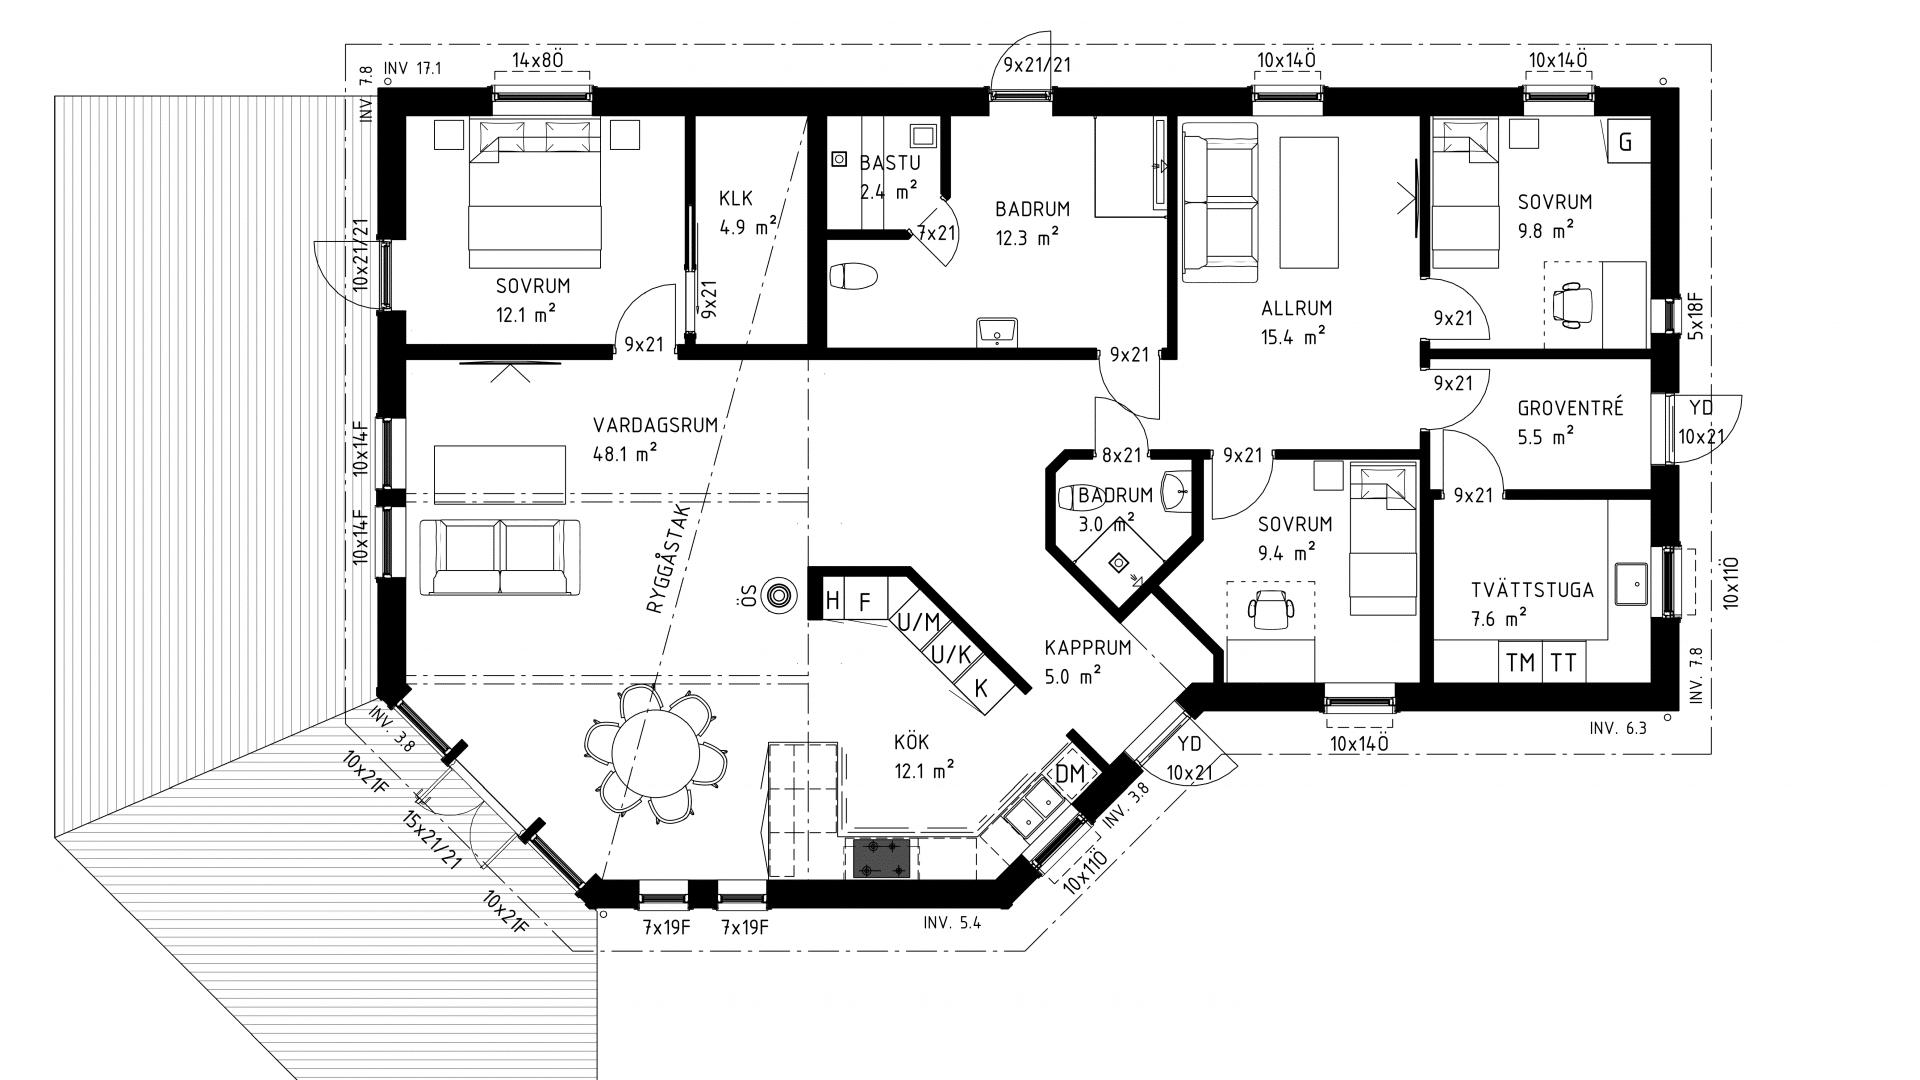 Johansson_Plan 1